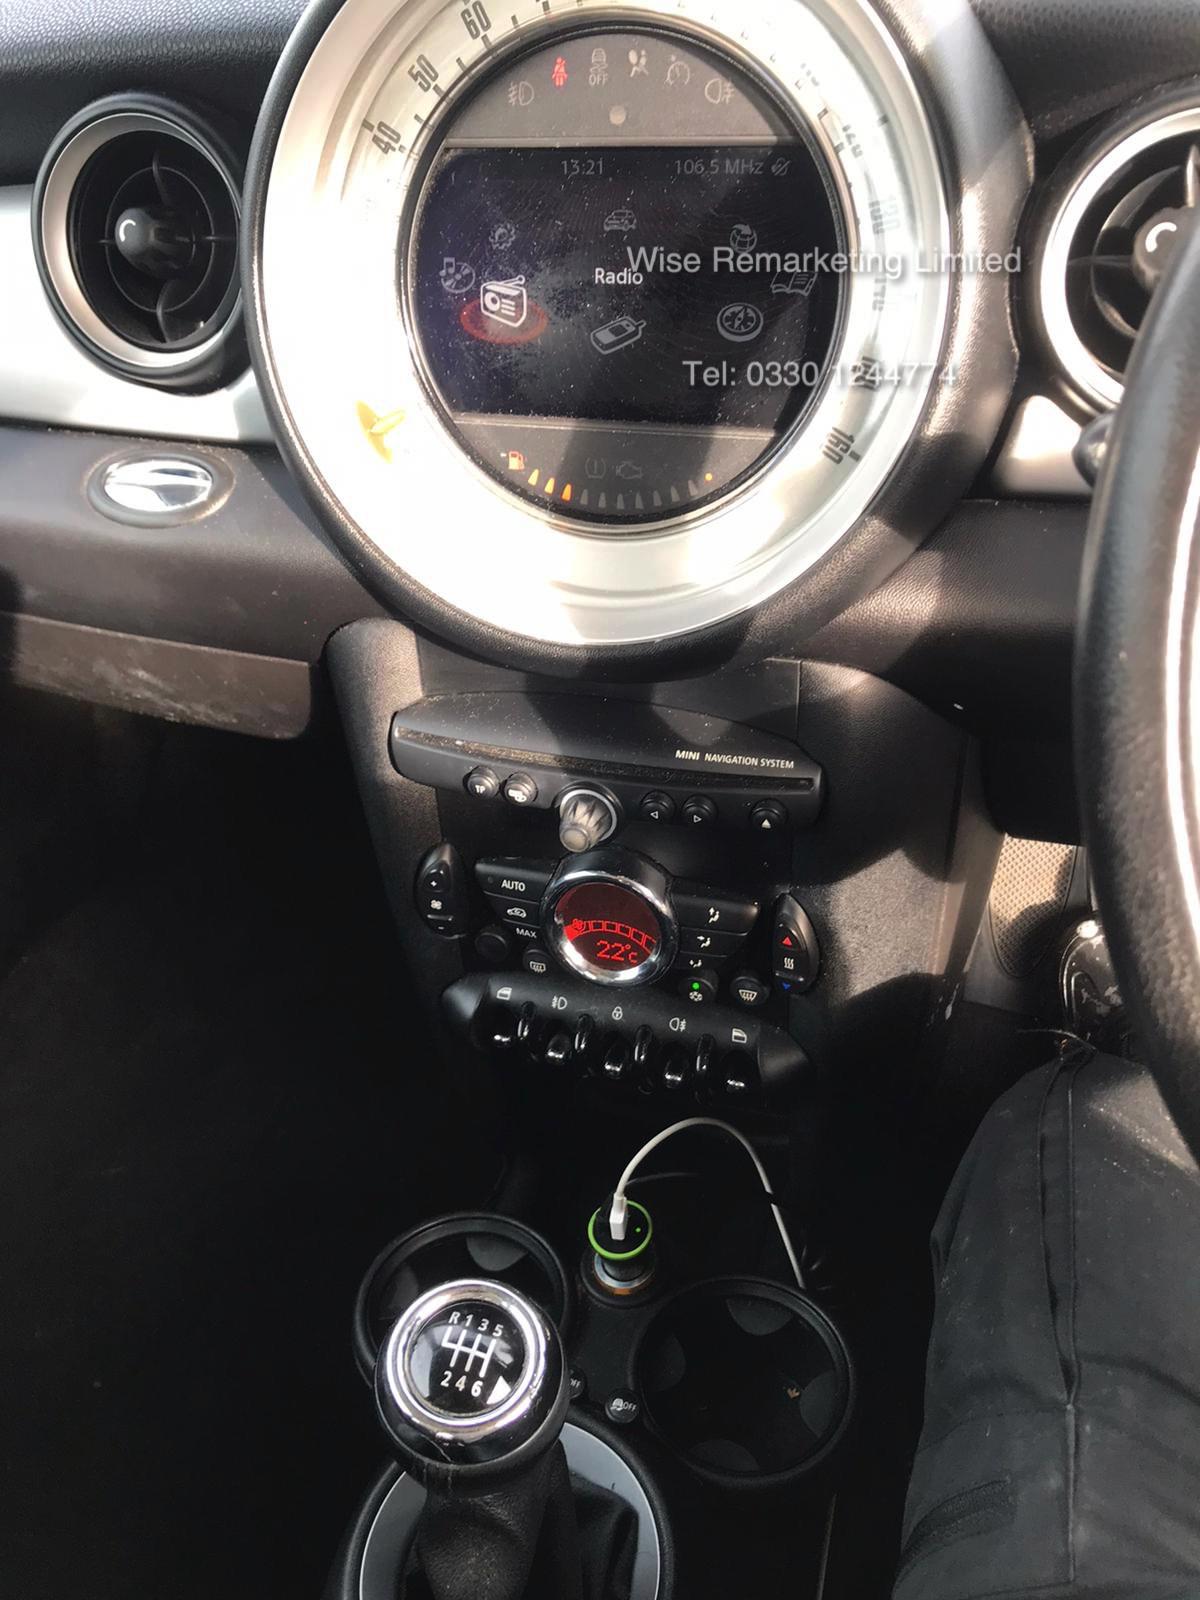 Lot 40 - Mini Cooper 1.6 D Hatchback - 2012 Model - Service History - Sat Nav